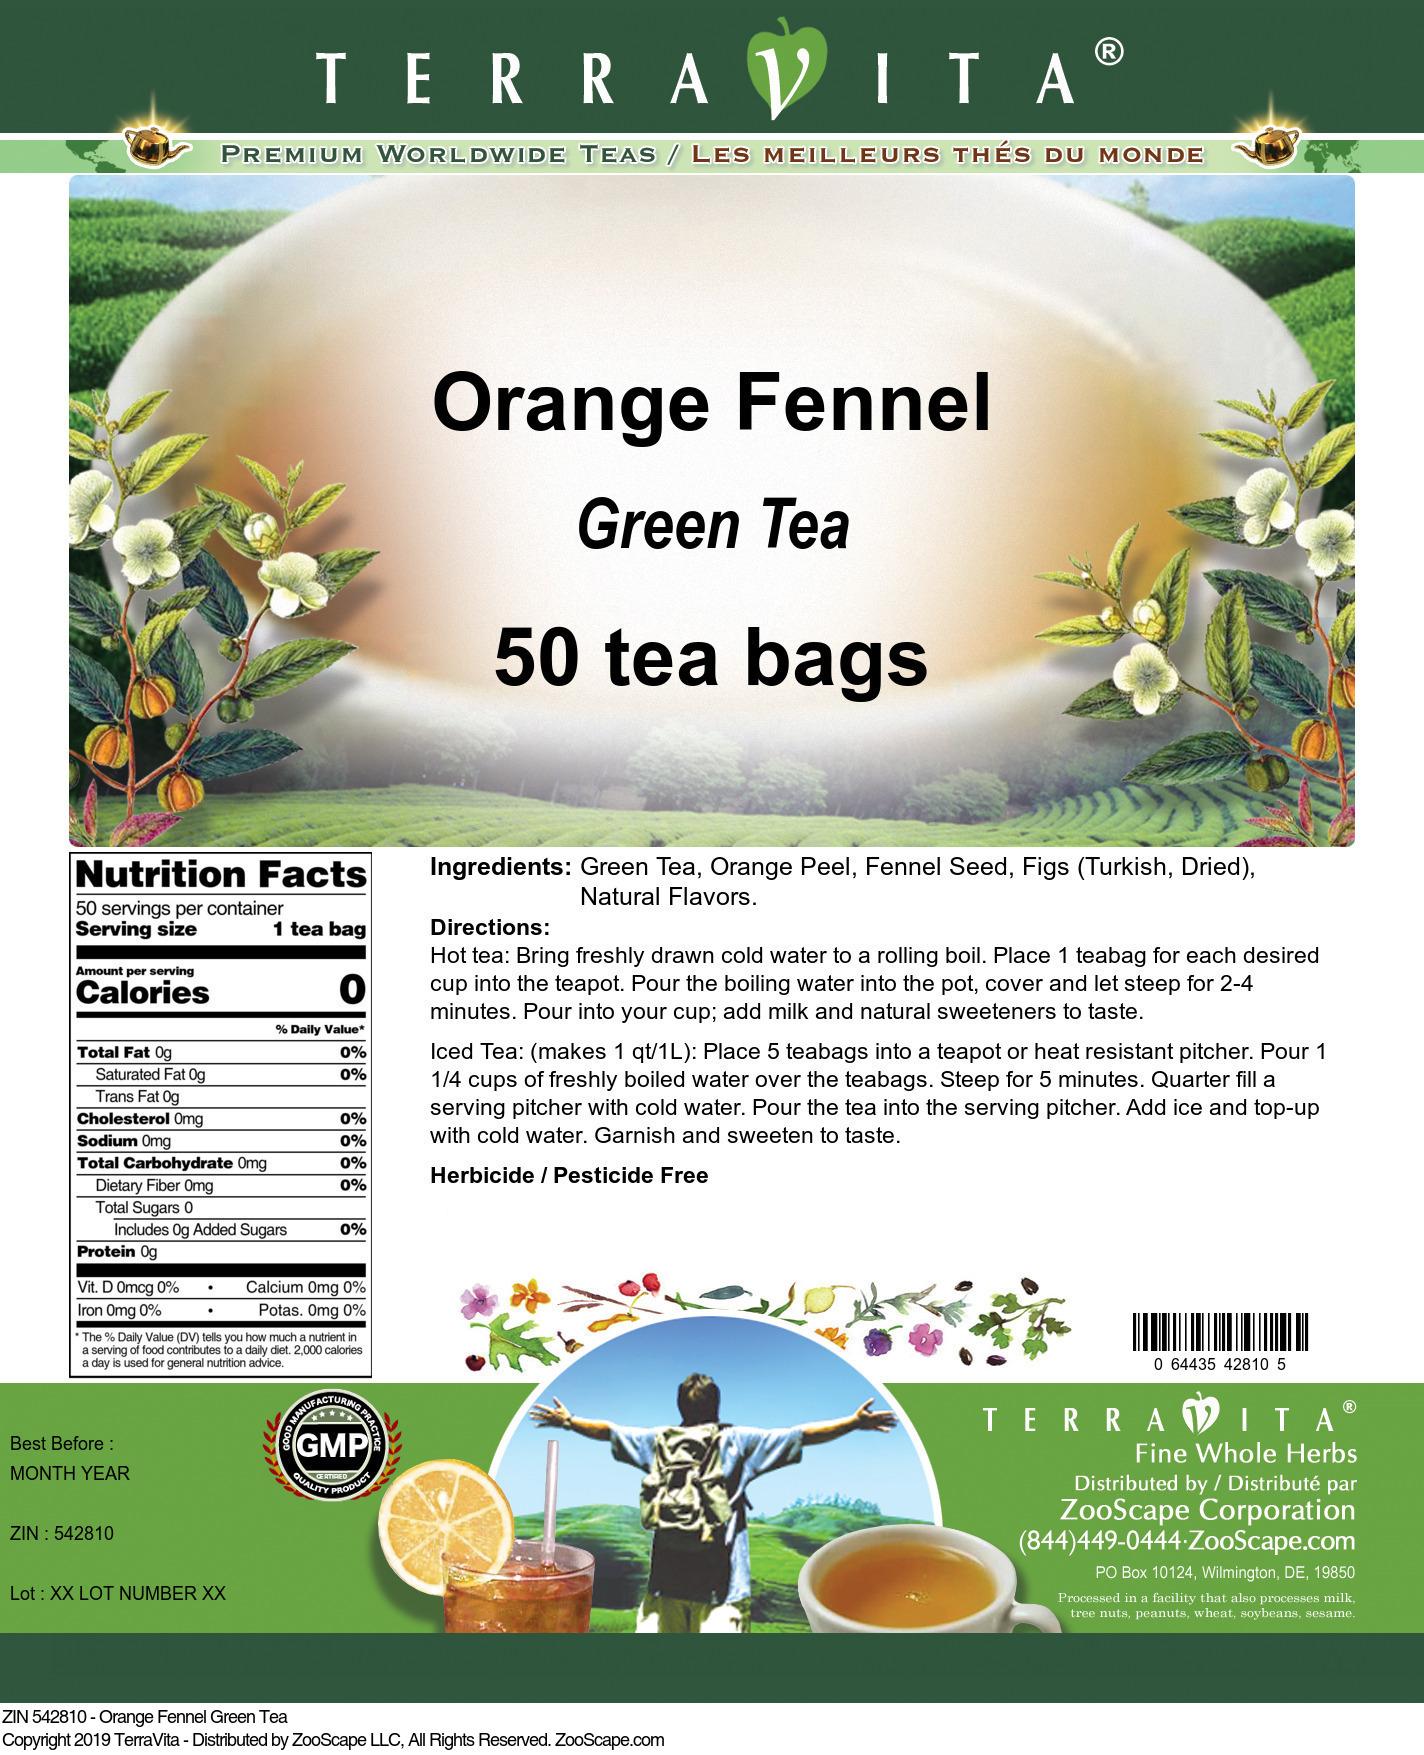 Orange Fennel Green Tea